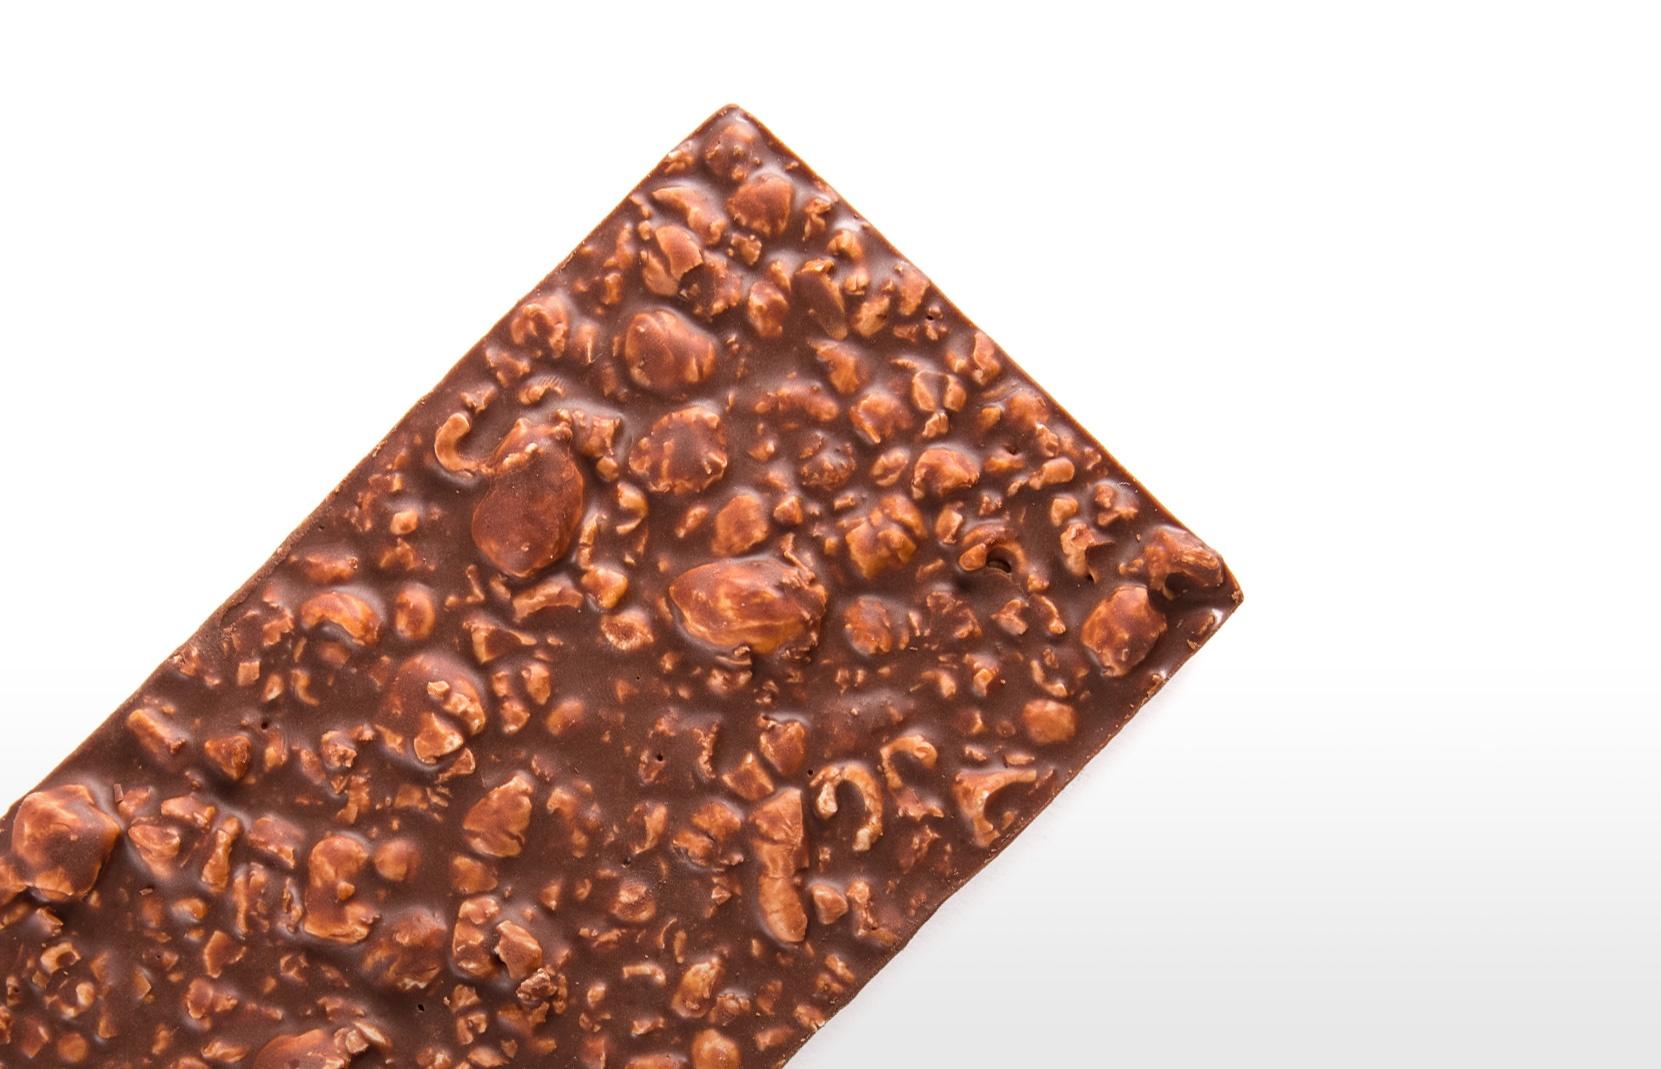 Charles - Kokosmelkchocolade met karamel popcorn